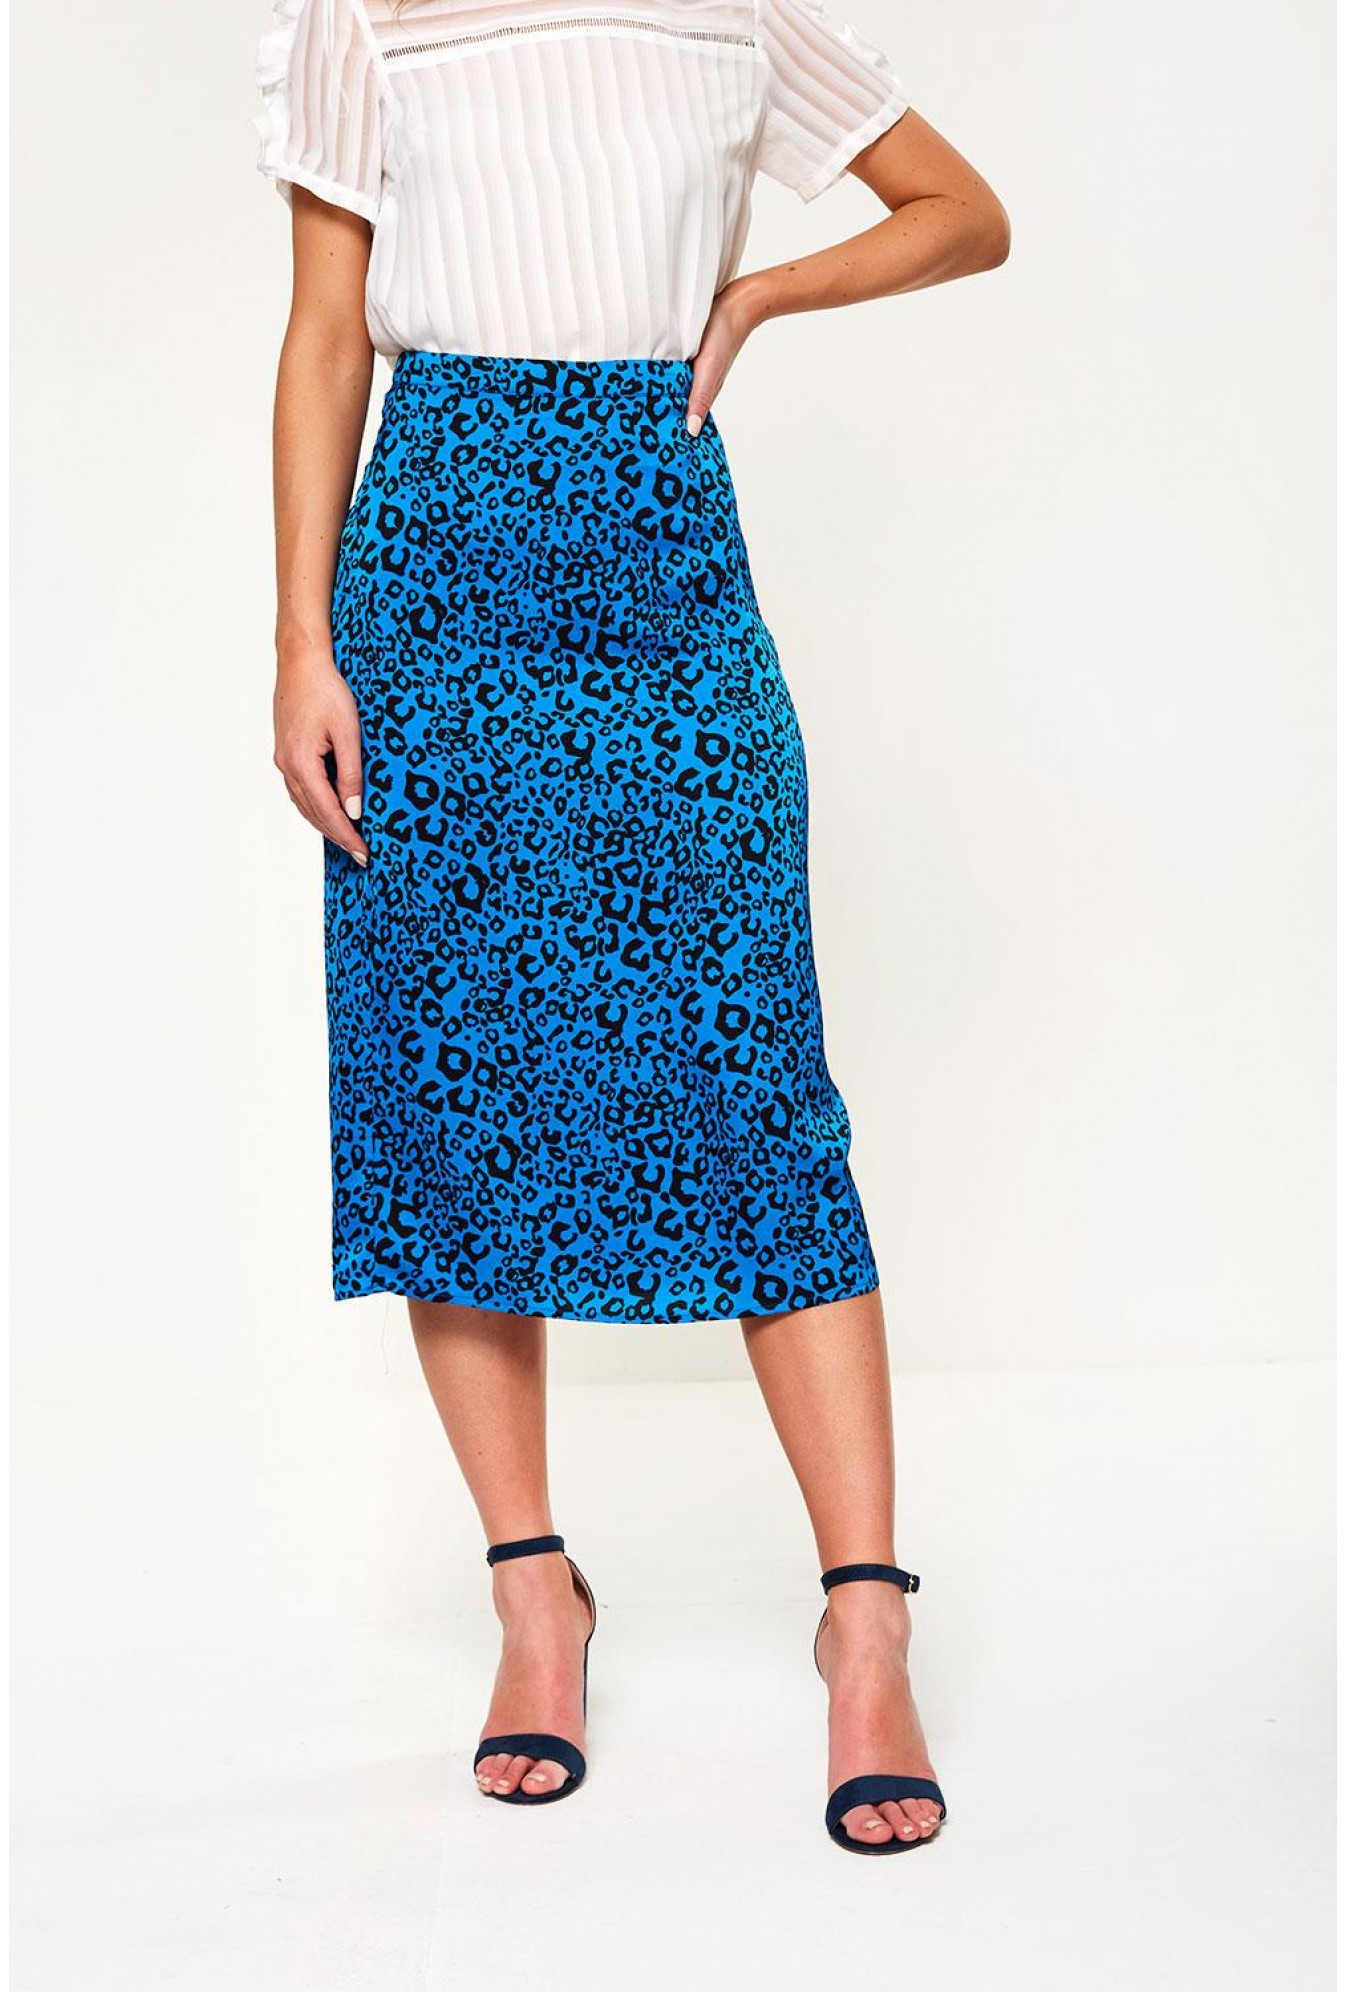 c625478d039b Vila Satin Leopard Print Skirt in Blue | iCLOTHING